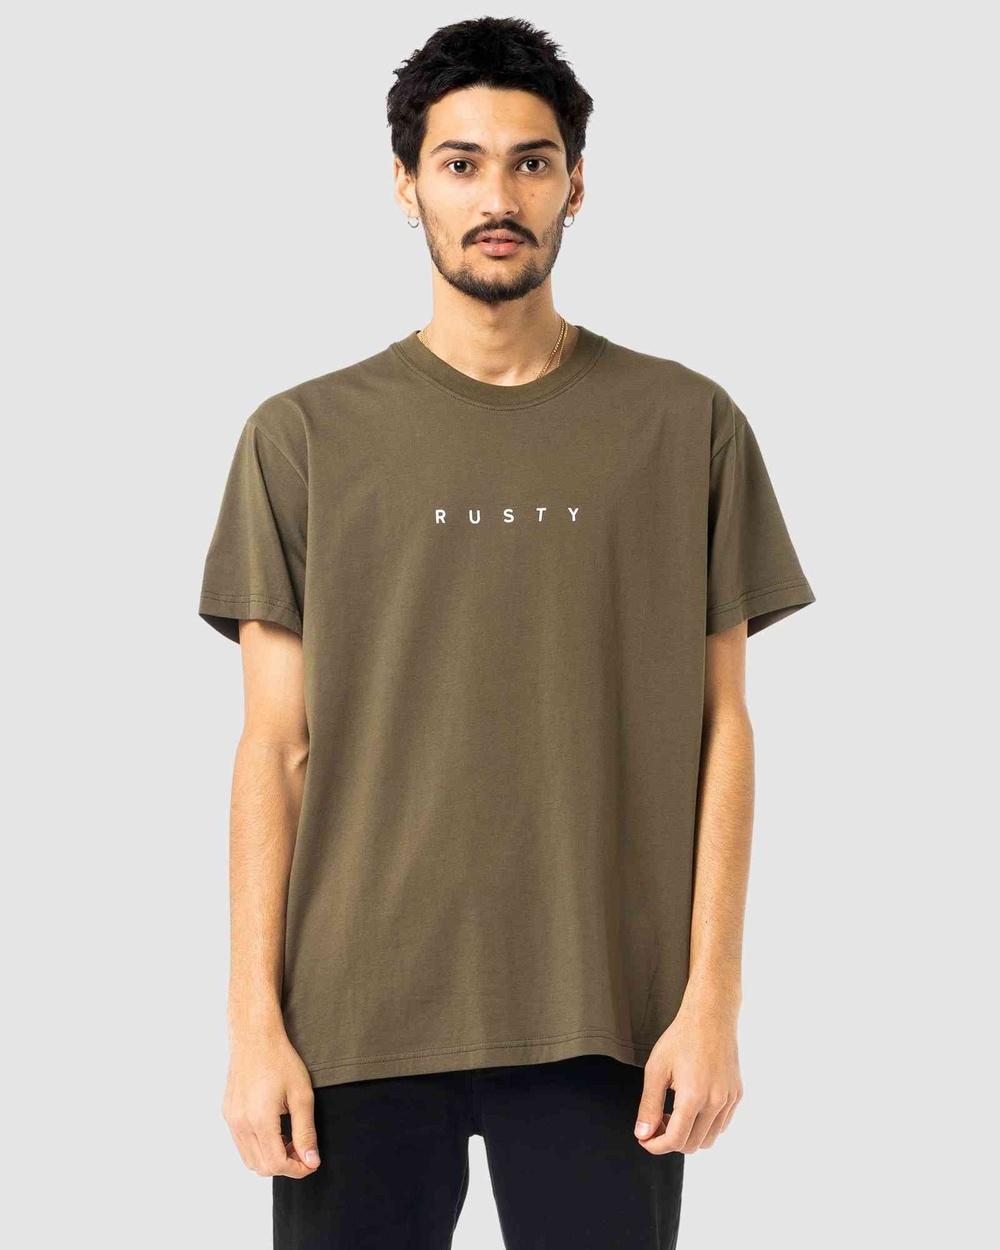 Rusty - Short Cut Short Sleeve Tee - Short Sleeve T-Shirts (GGN) Short Cut Short Sleeve Tee